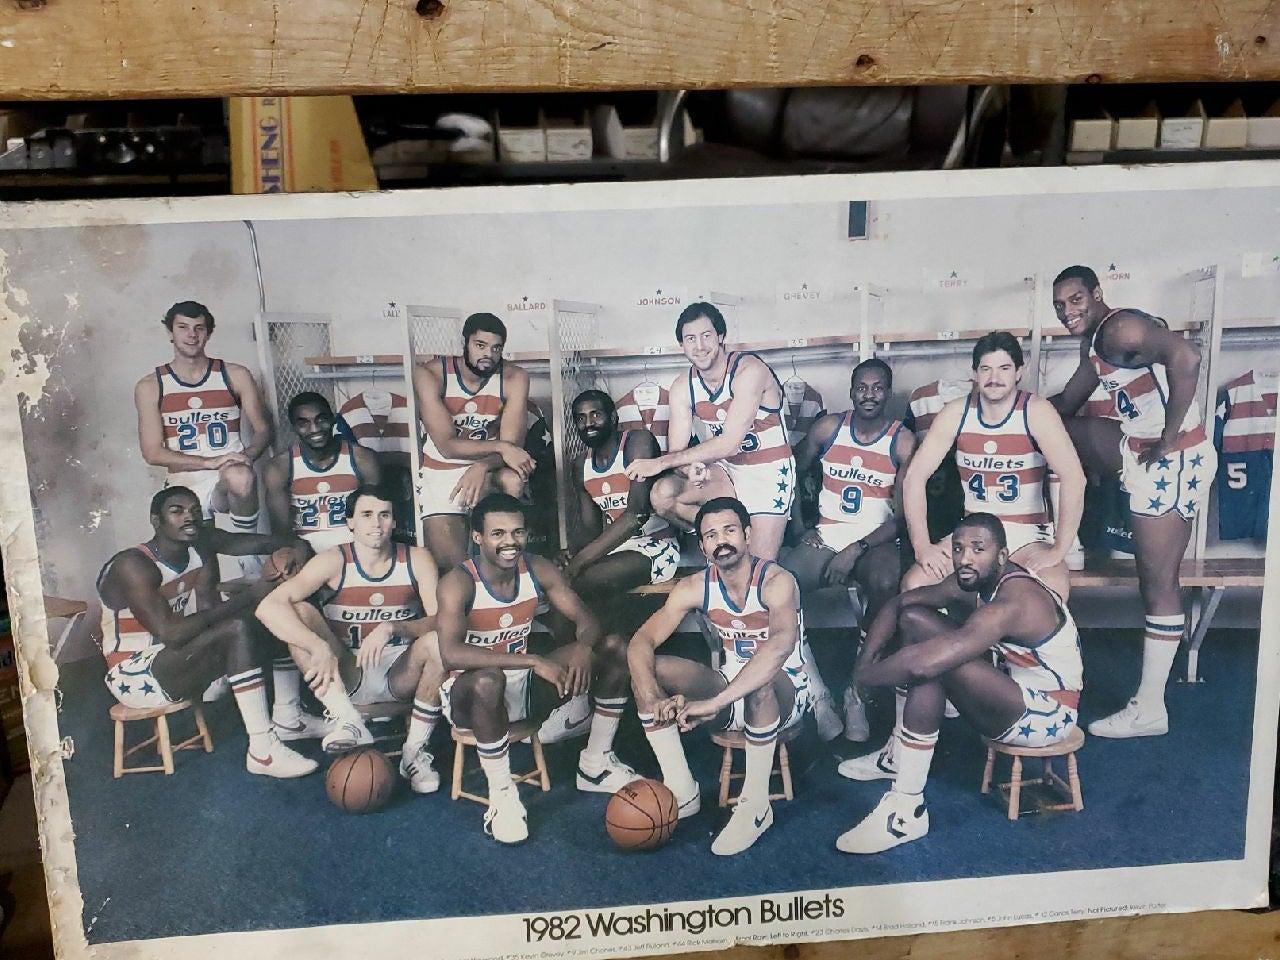 1982 washington bullets team picture